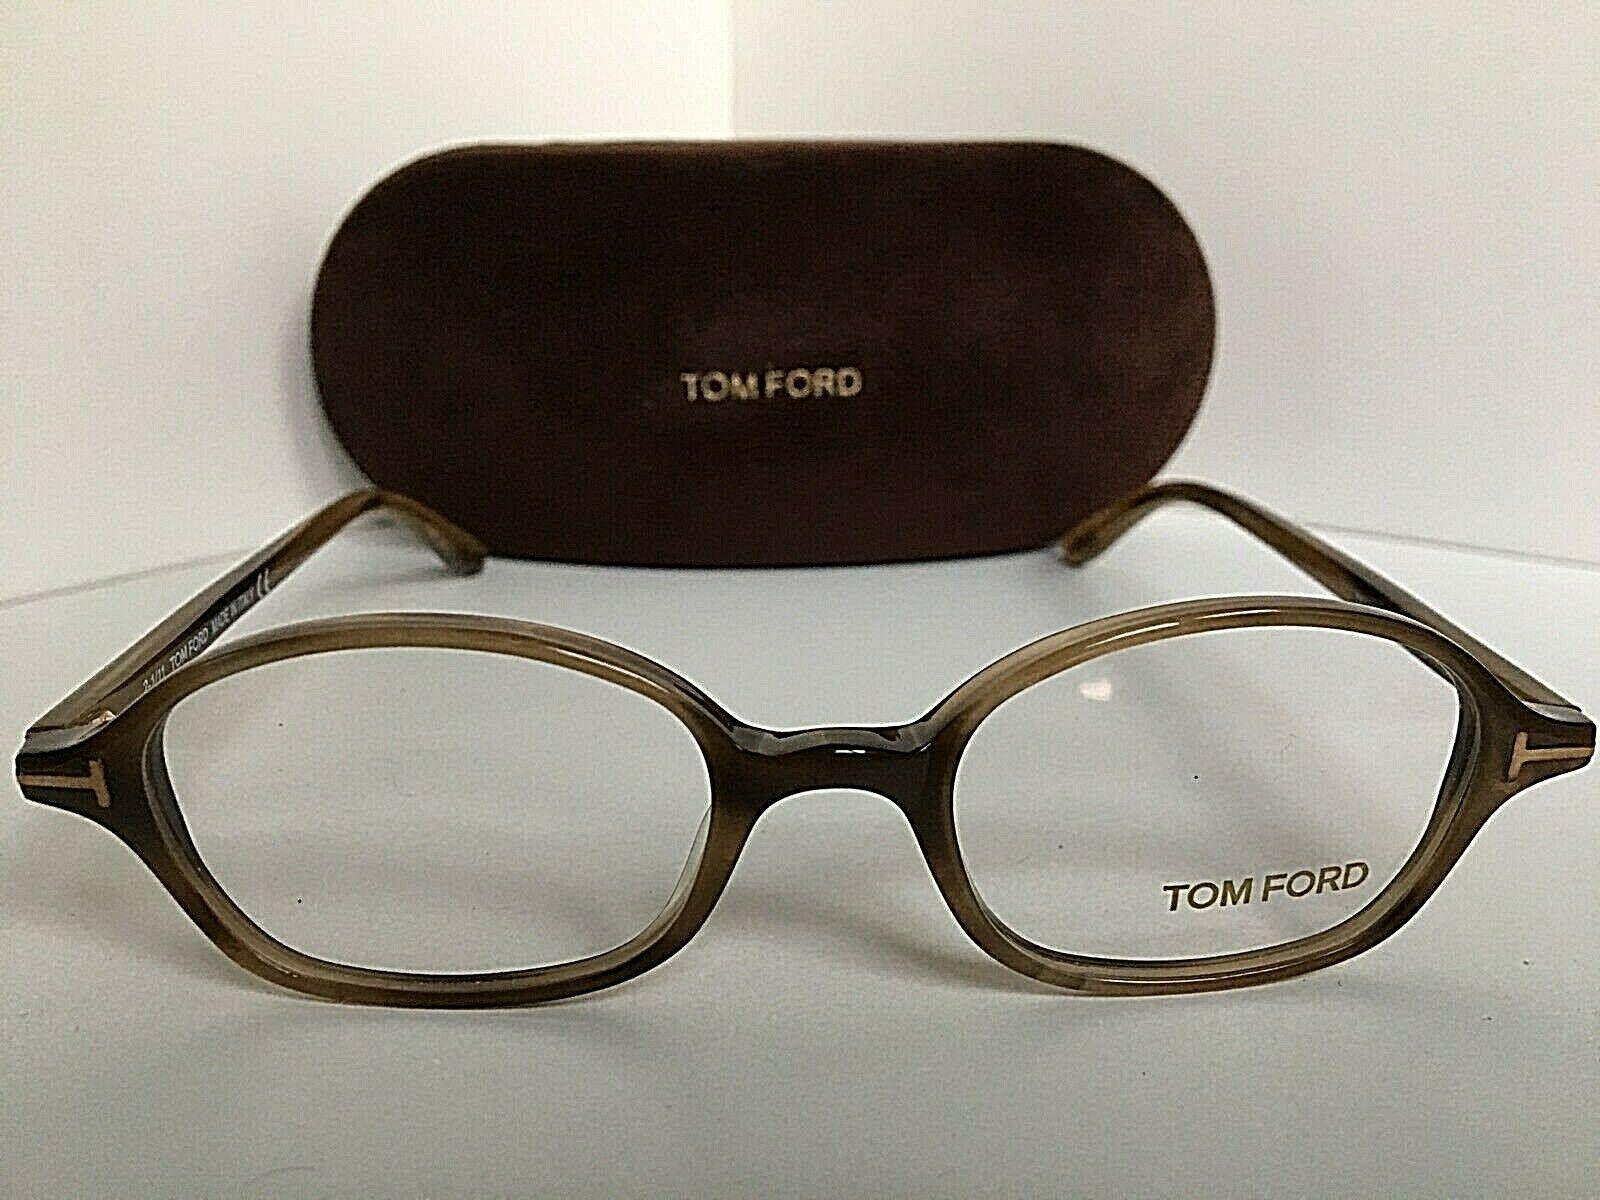 New Tom Ford TF 5151 047 47mm Rx Light Havana Eyeglasses Frame Italy